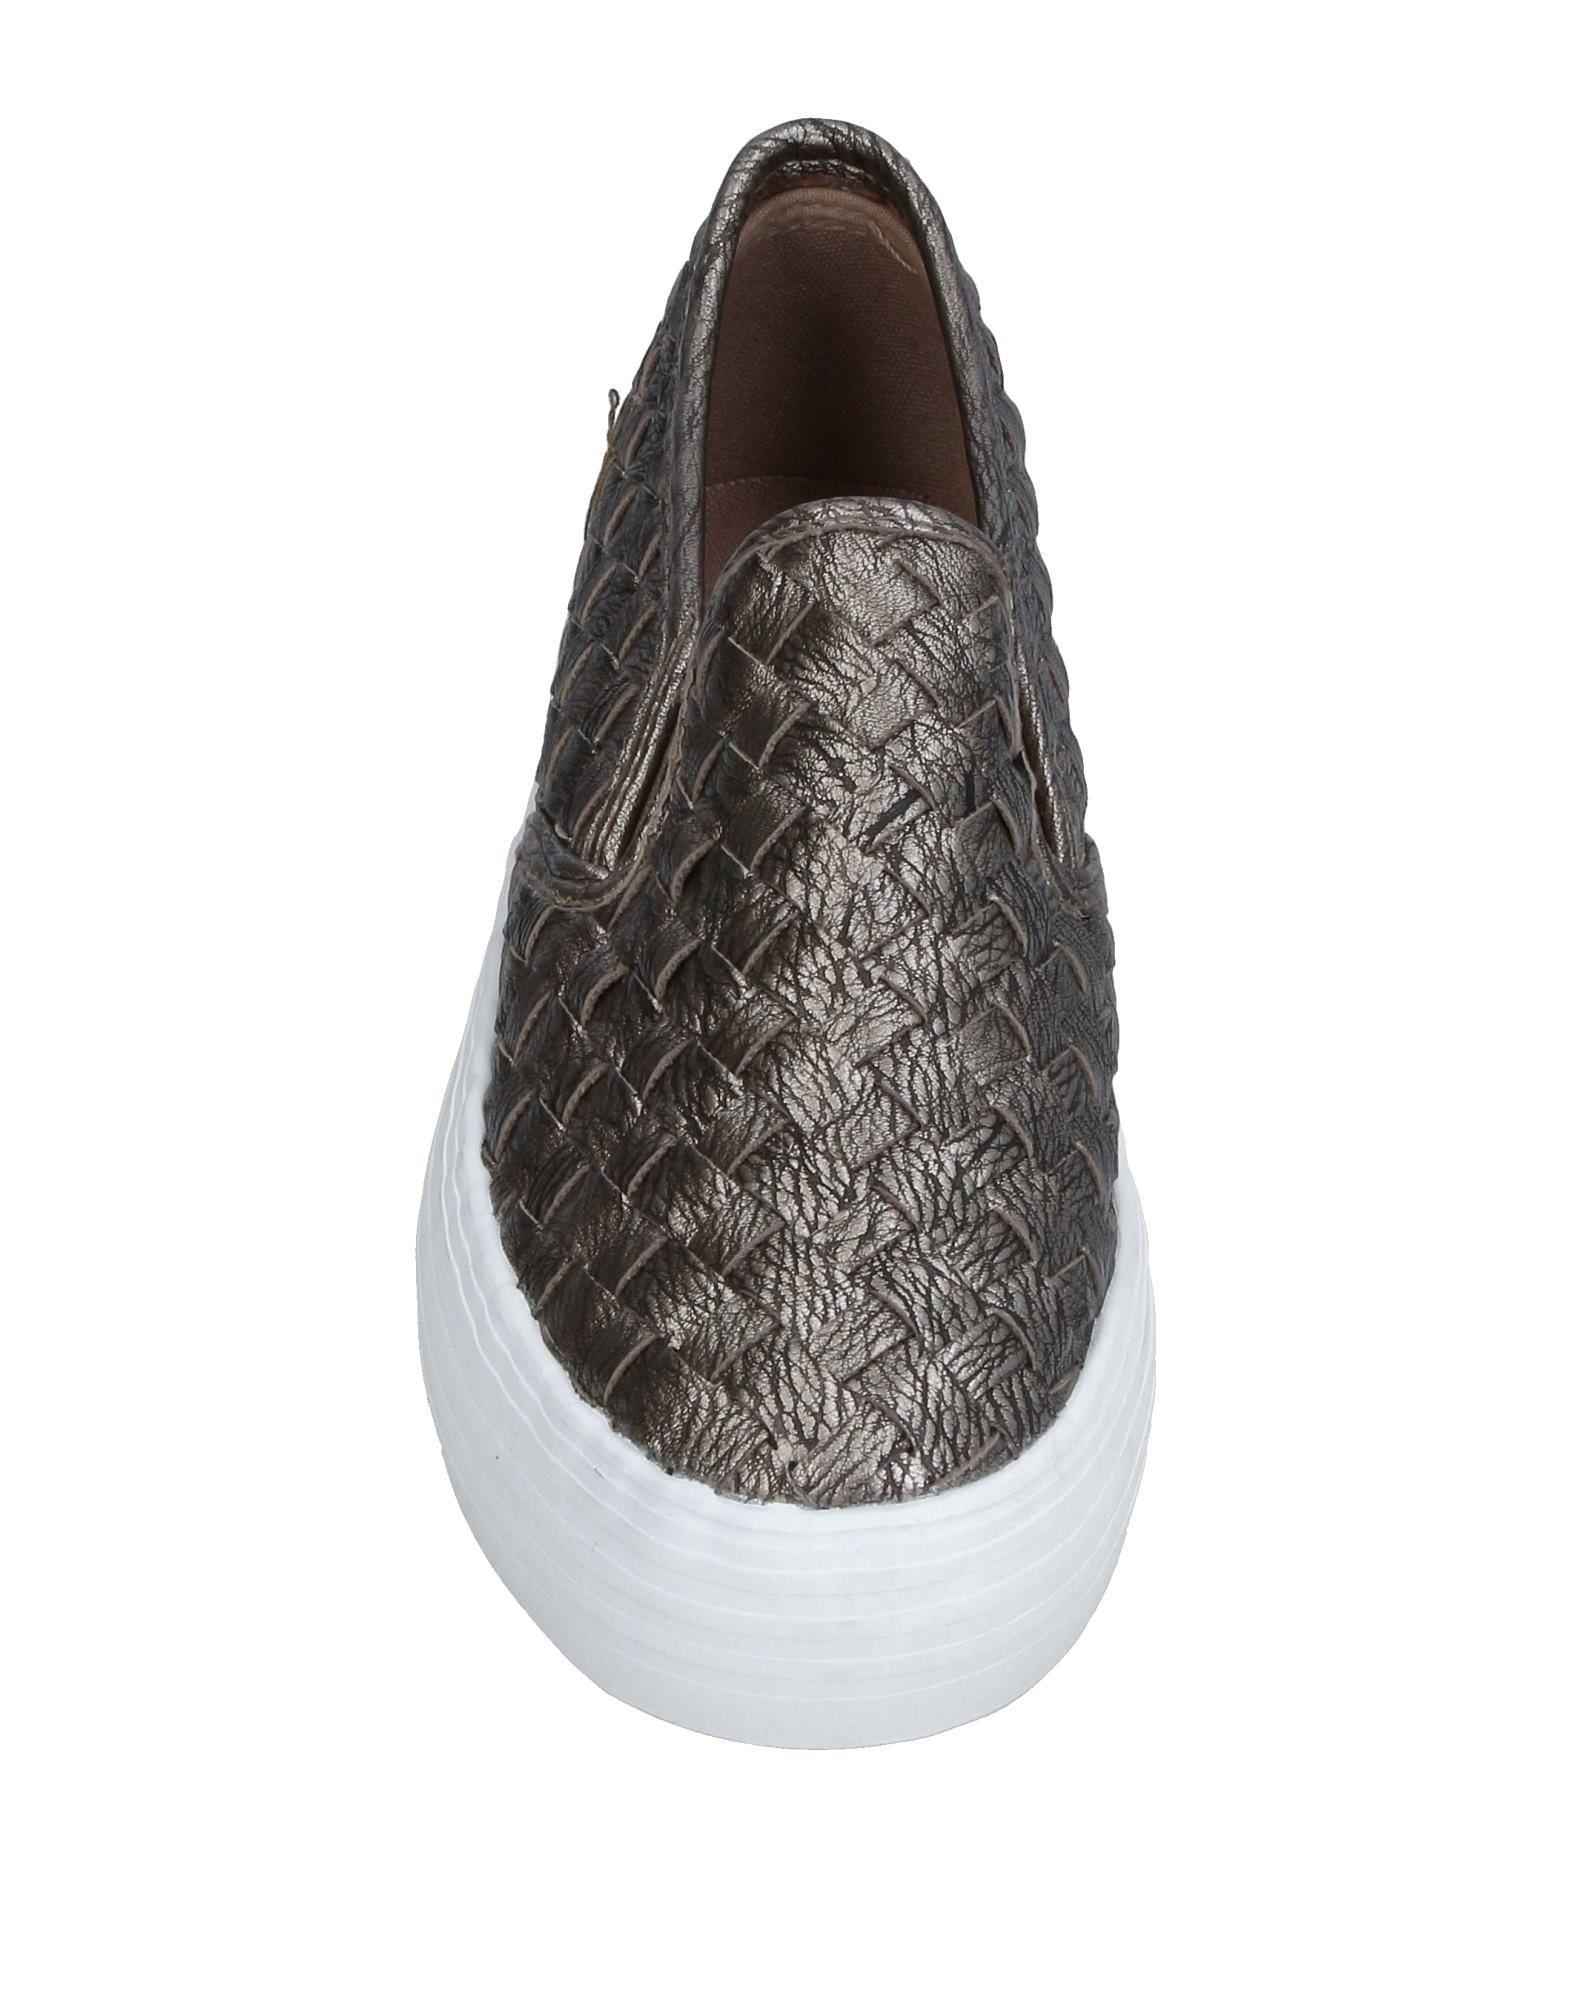 Manila Grace Sneakers Damen   Damen 11356879TJ Gute Qualität beliebte Schuhe 272dee